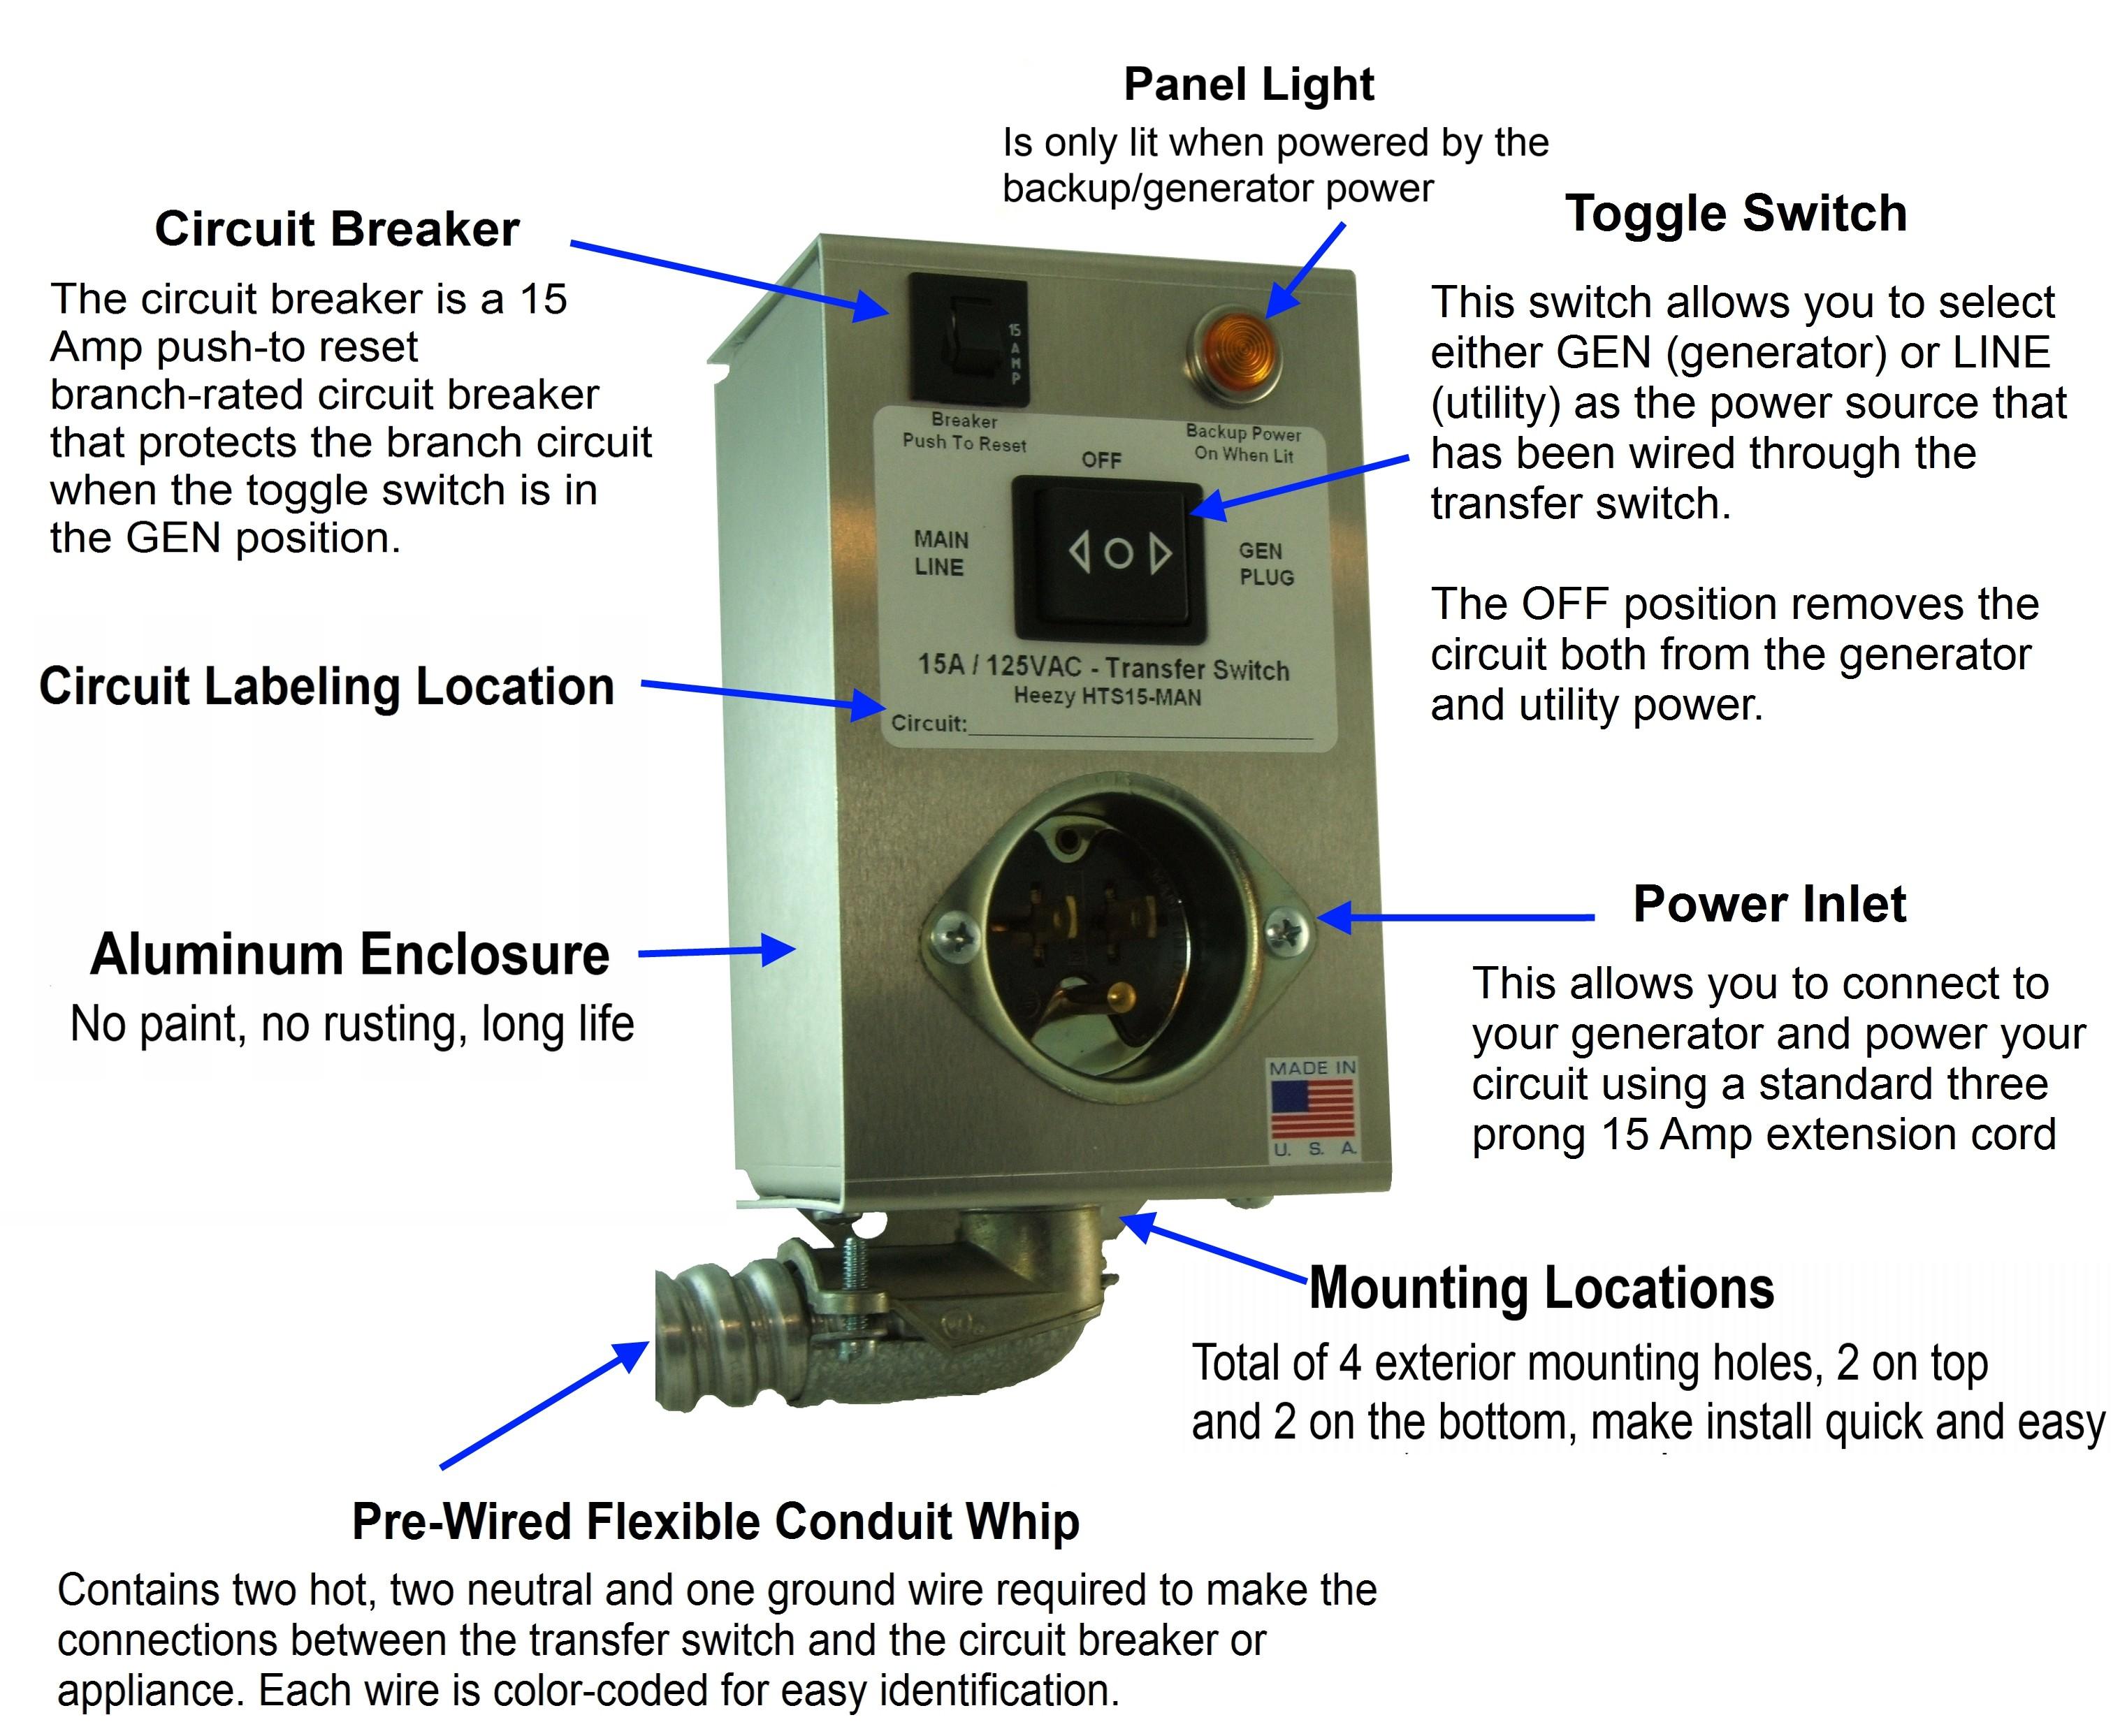 Manual Generator Transfer Switch Wiring Diagram Manual Generator Transfer Switch Wiring Diagram Of Manual Generator Transfer Switch Wiring Diagram